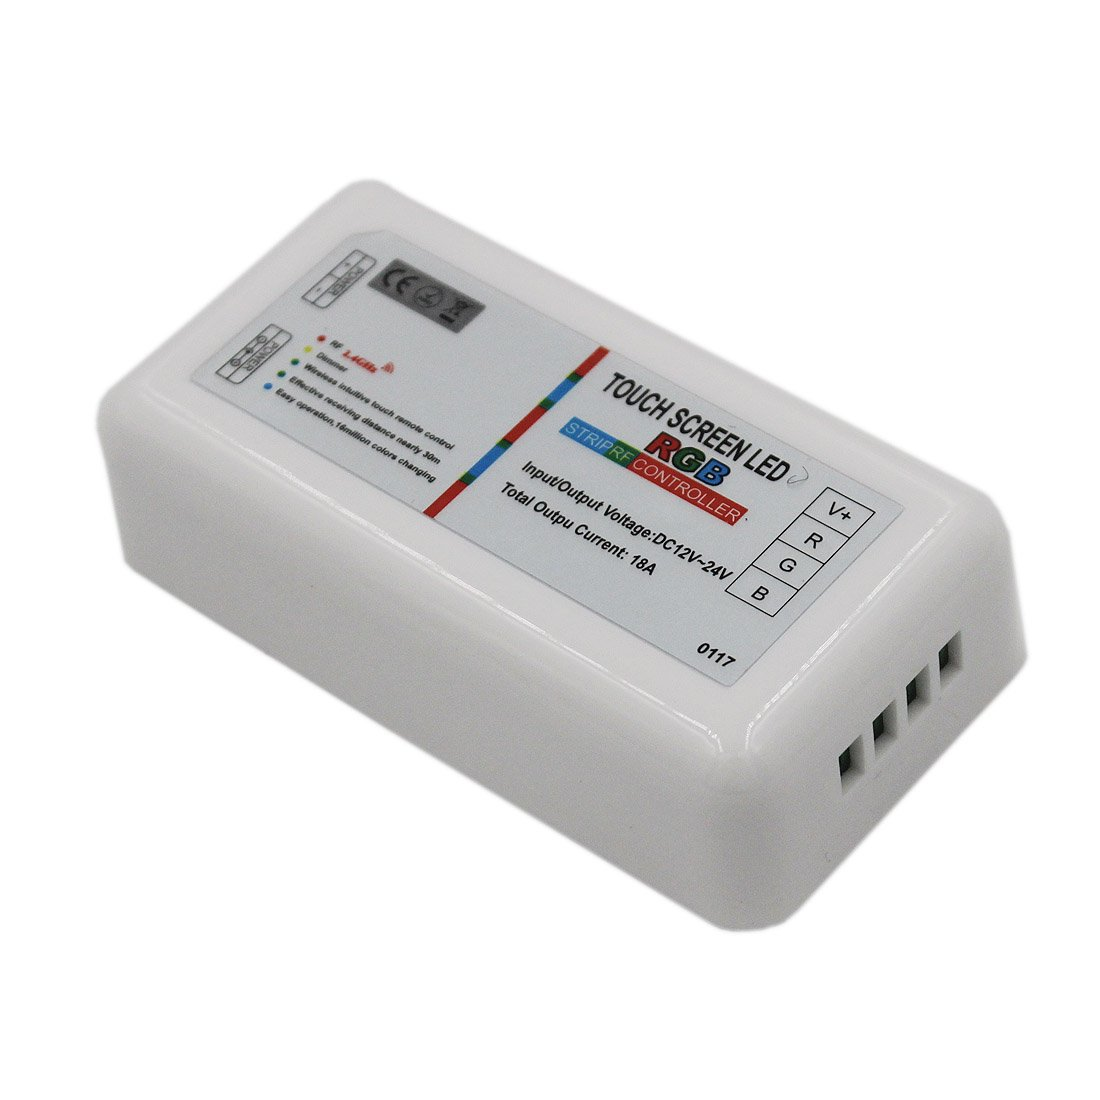 JOYLAND 2.4G RF Wireless 4 Channels Touch Screen Controller DC 12V//24V For Flexible RGBW LED Strip Light